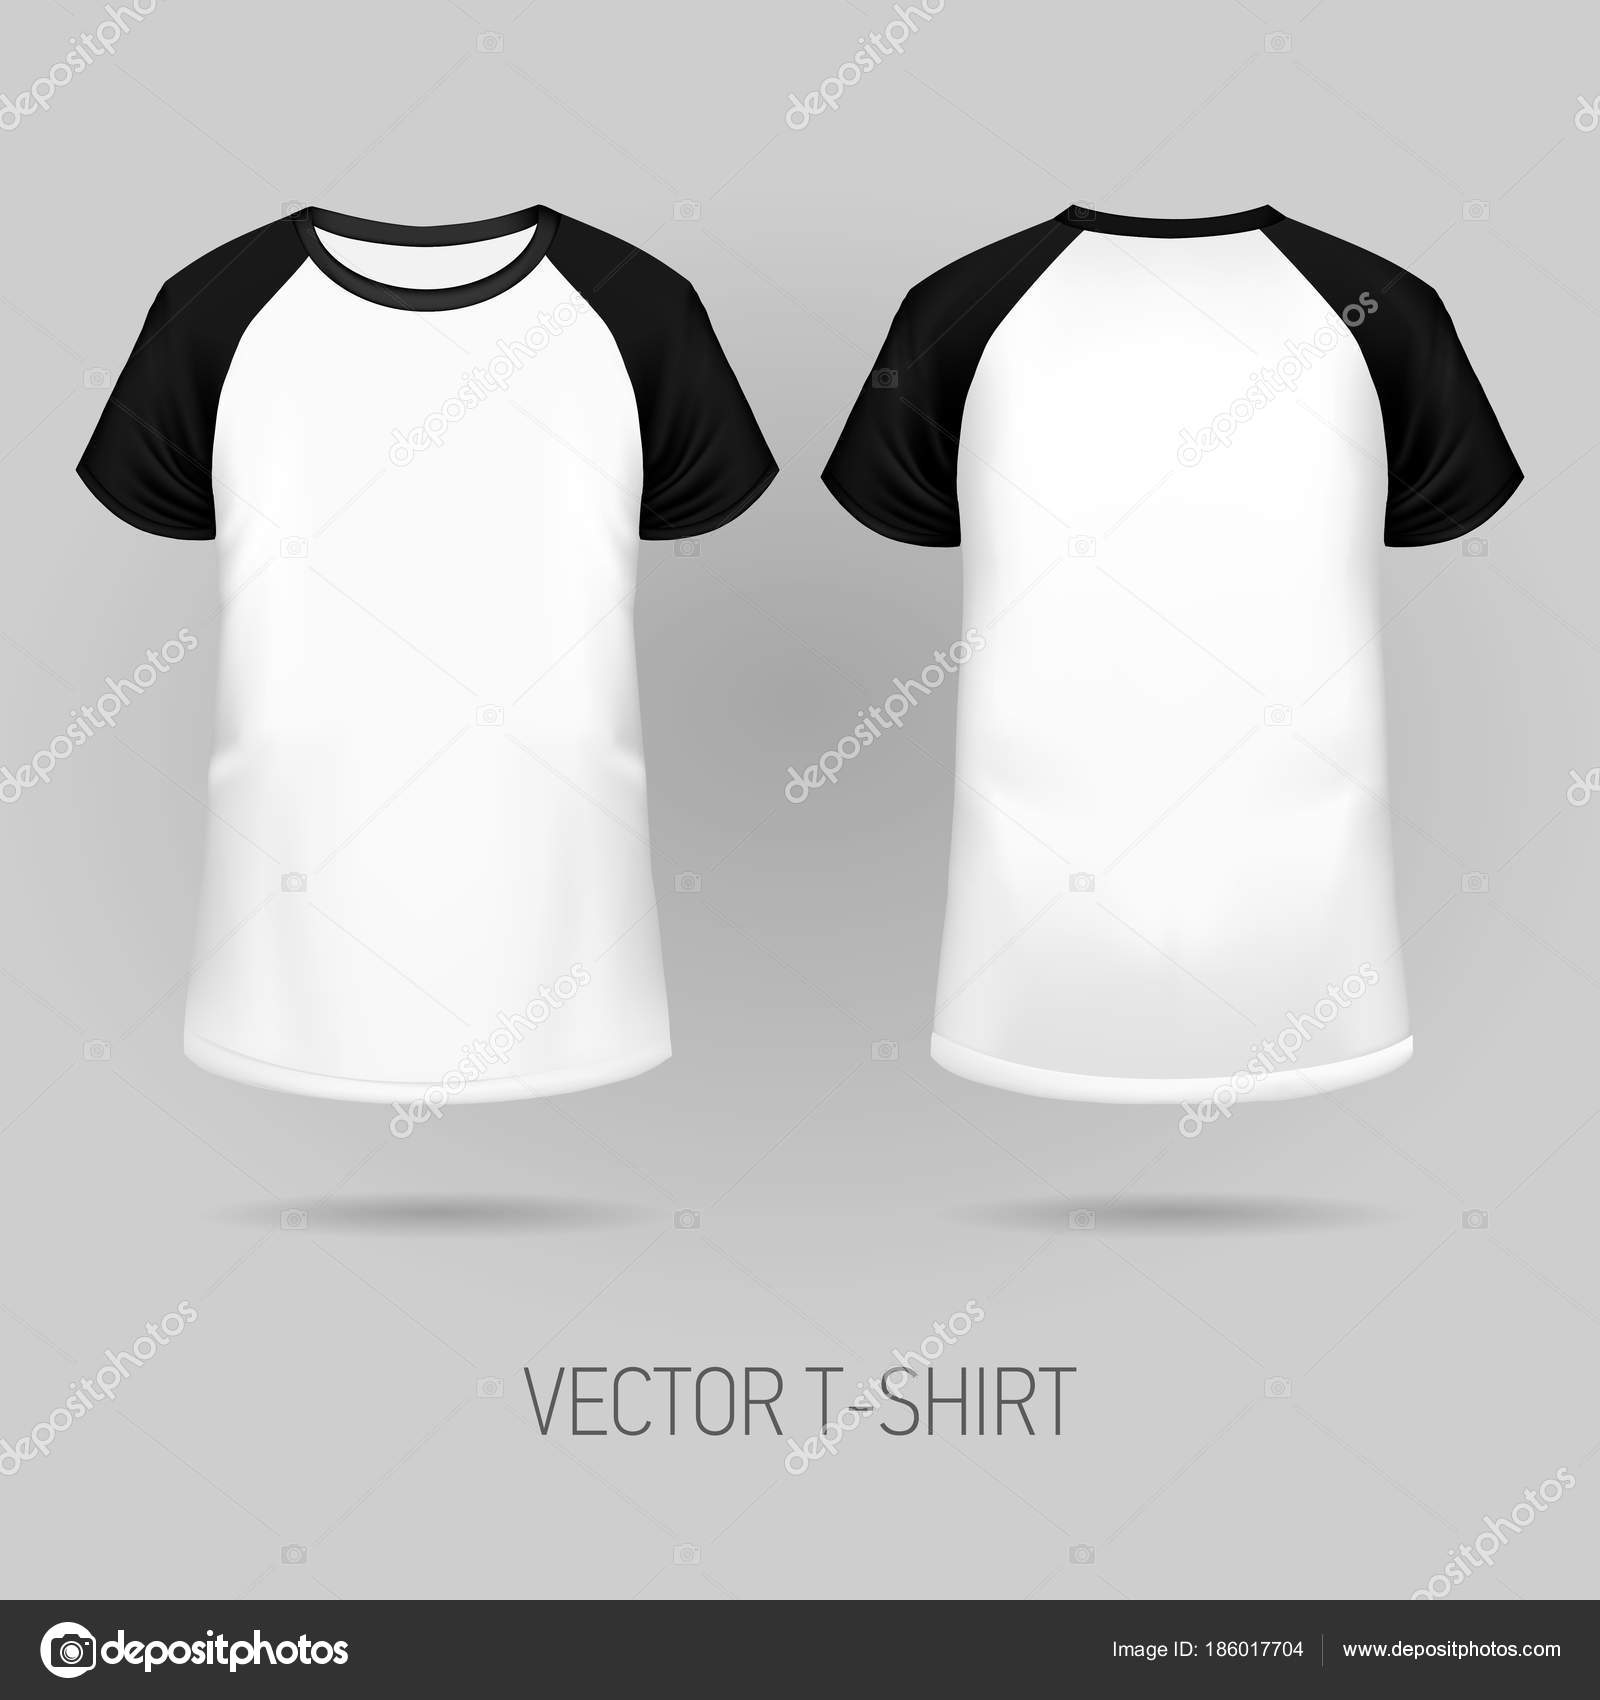 9032e69ad8 Camiseta Raglan con negro manga corta en frente y espalda